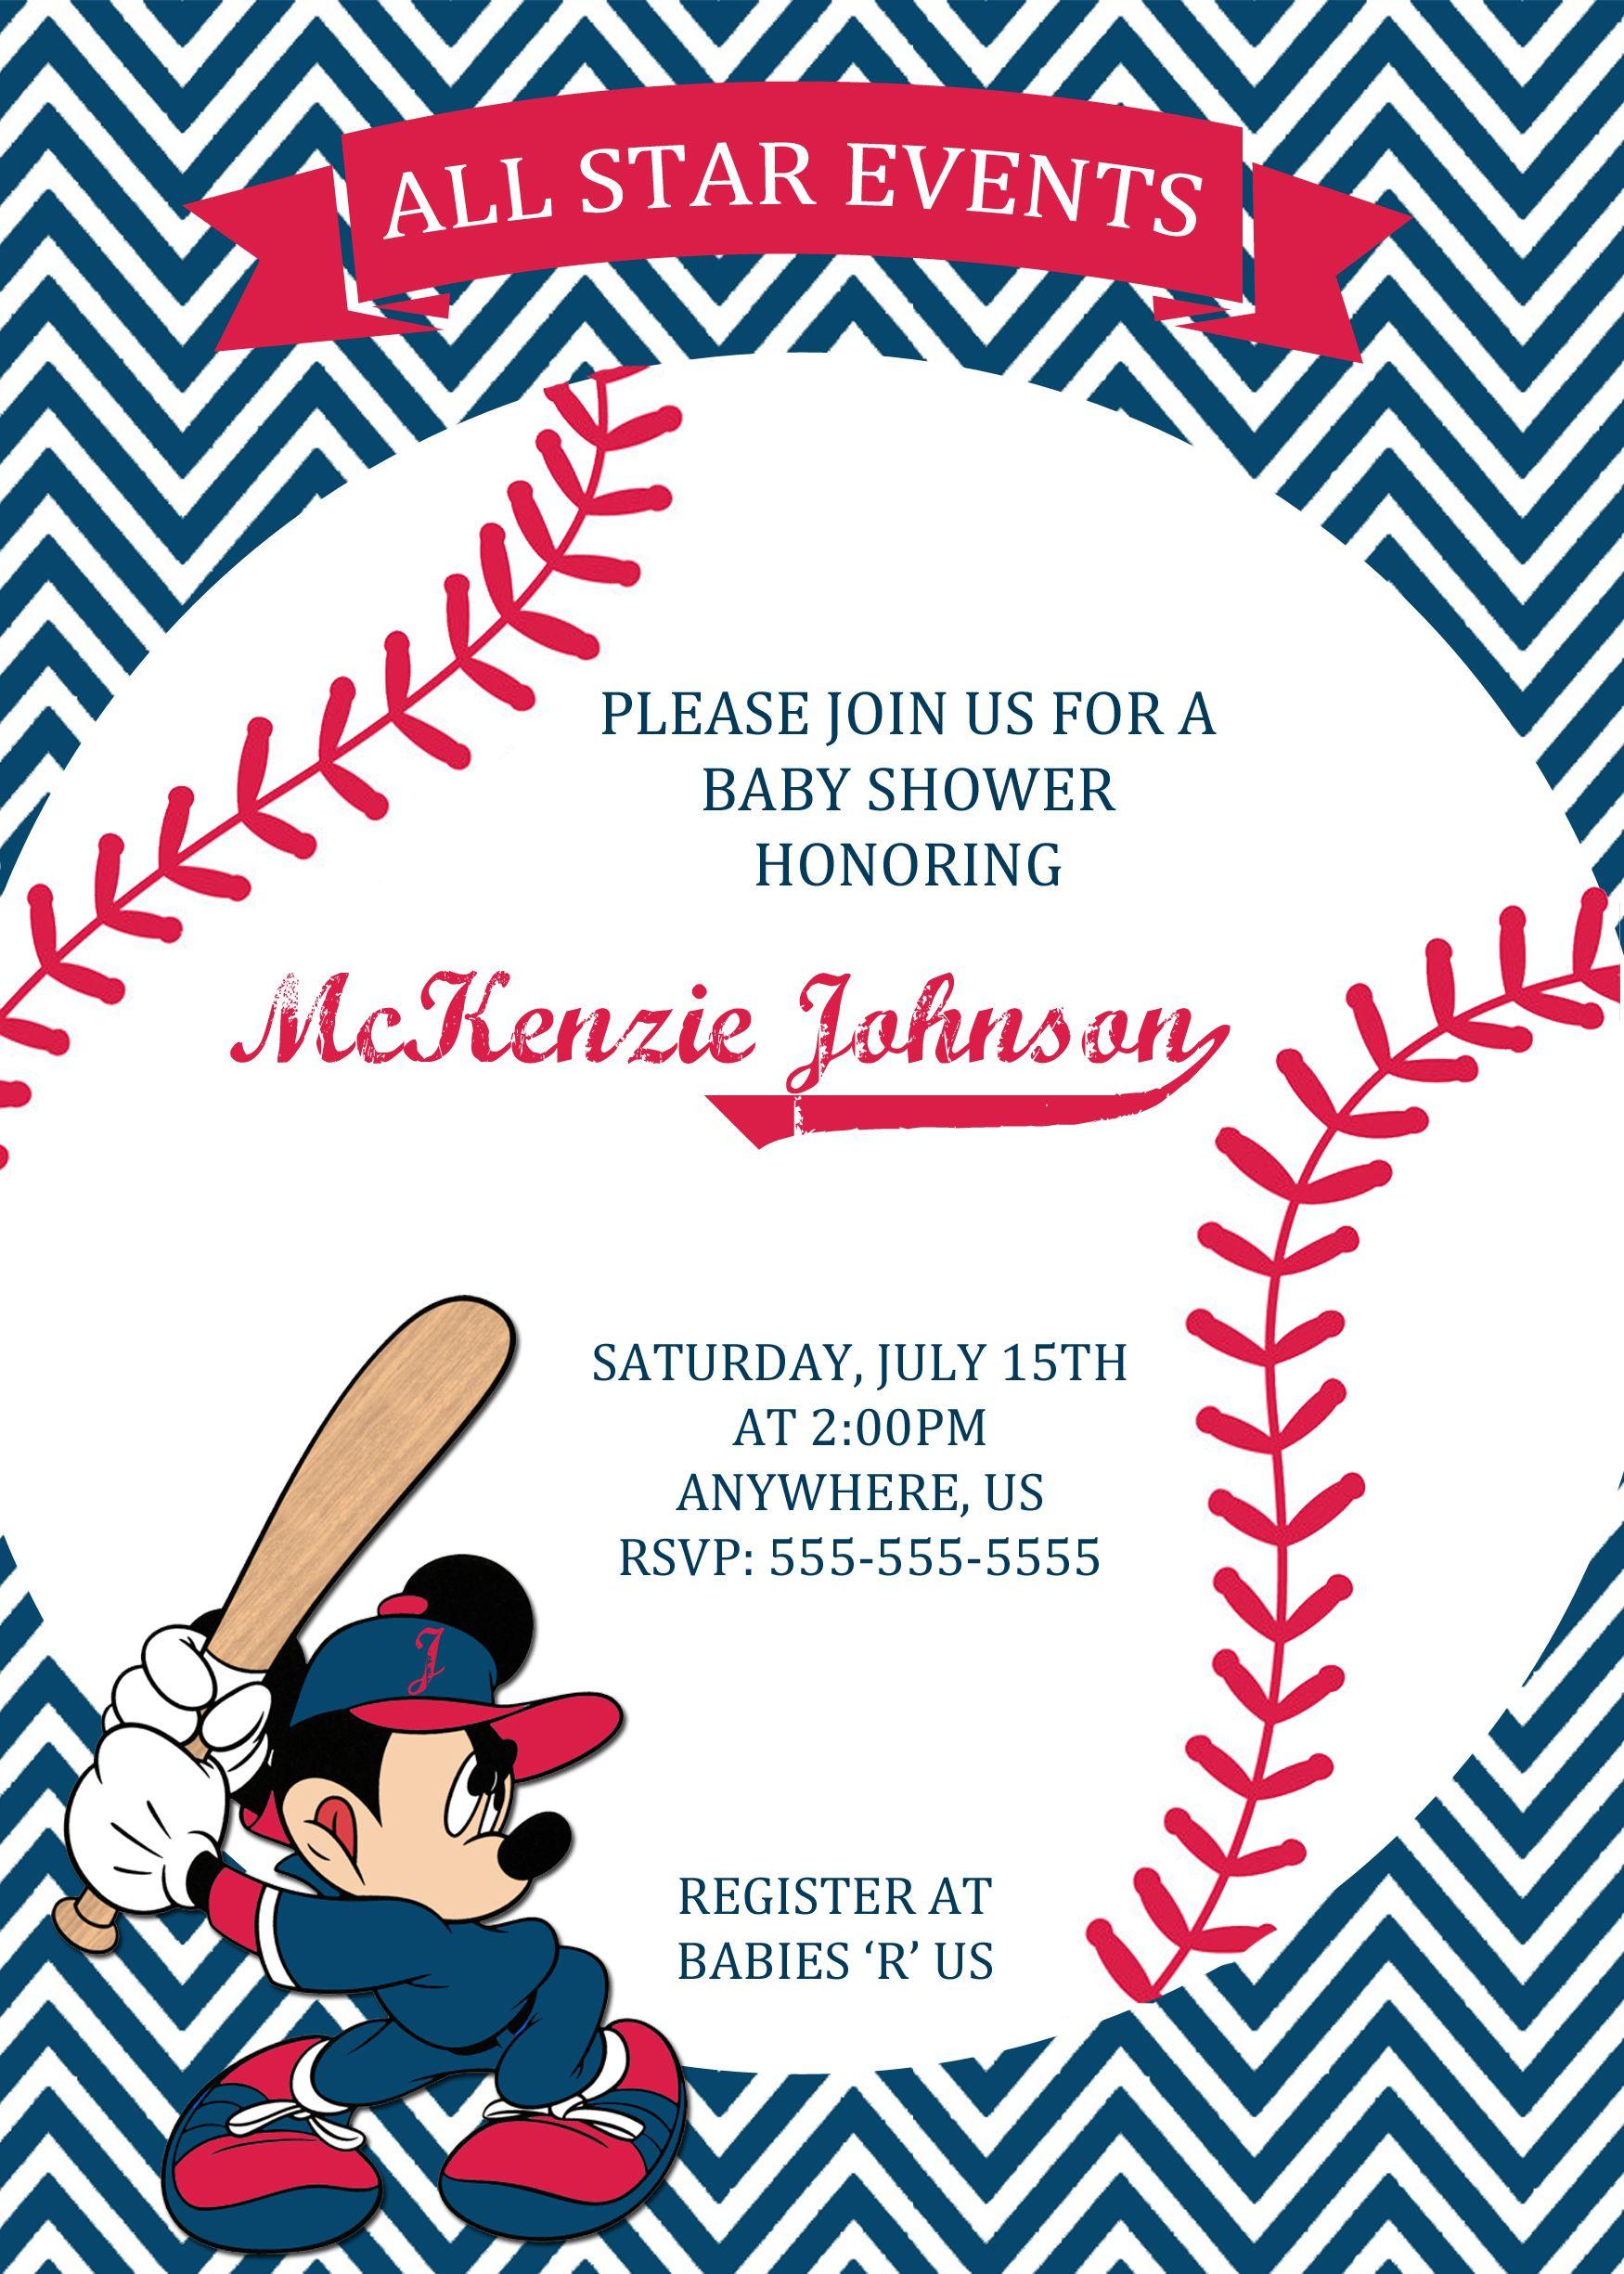 Mickey Mouse Baseball Baby Shower Invitation $8.99 | Baby Shower ...